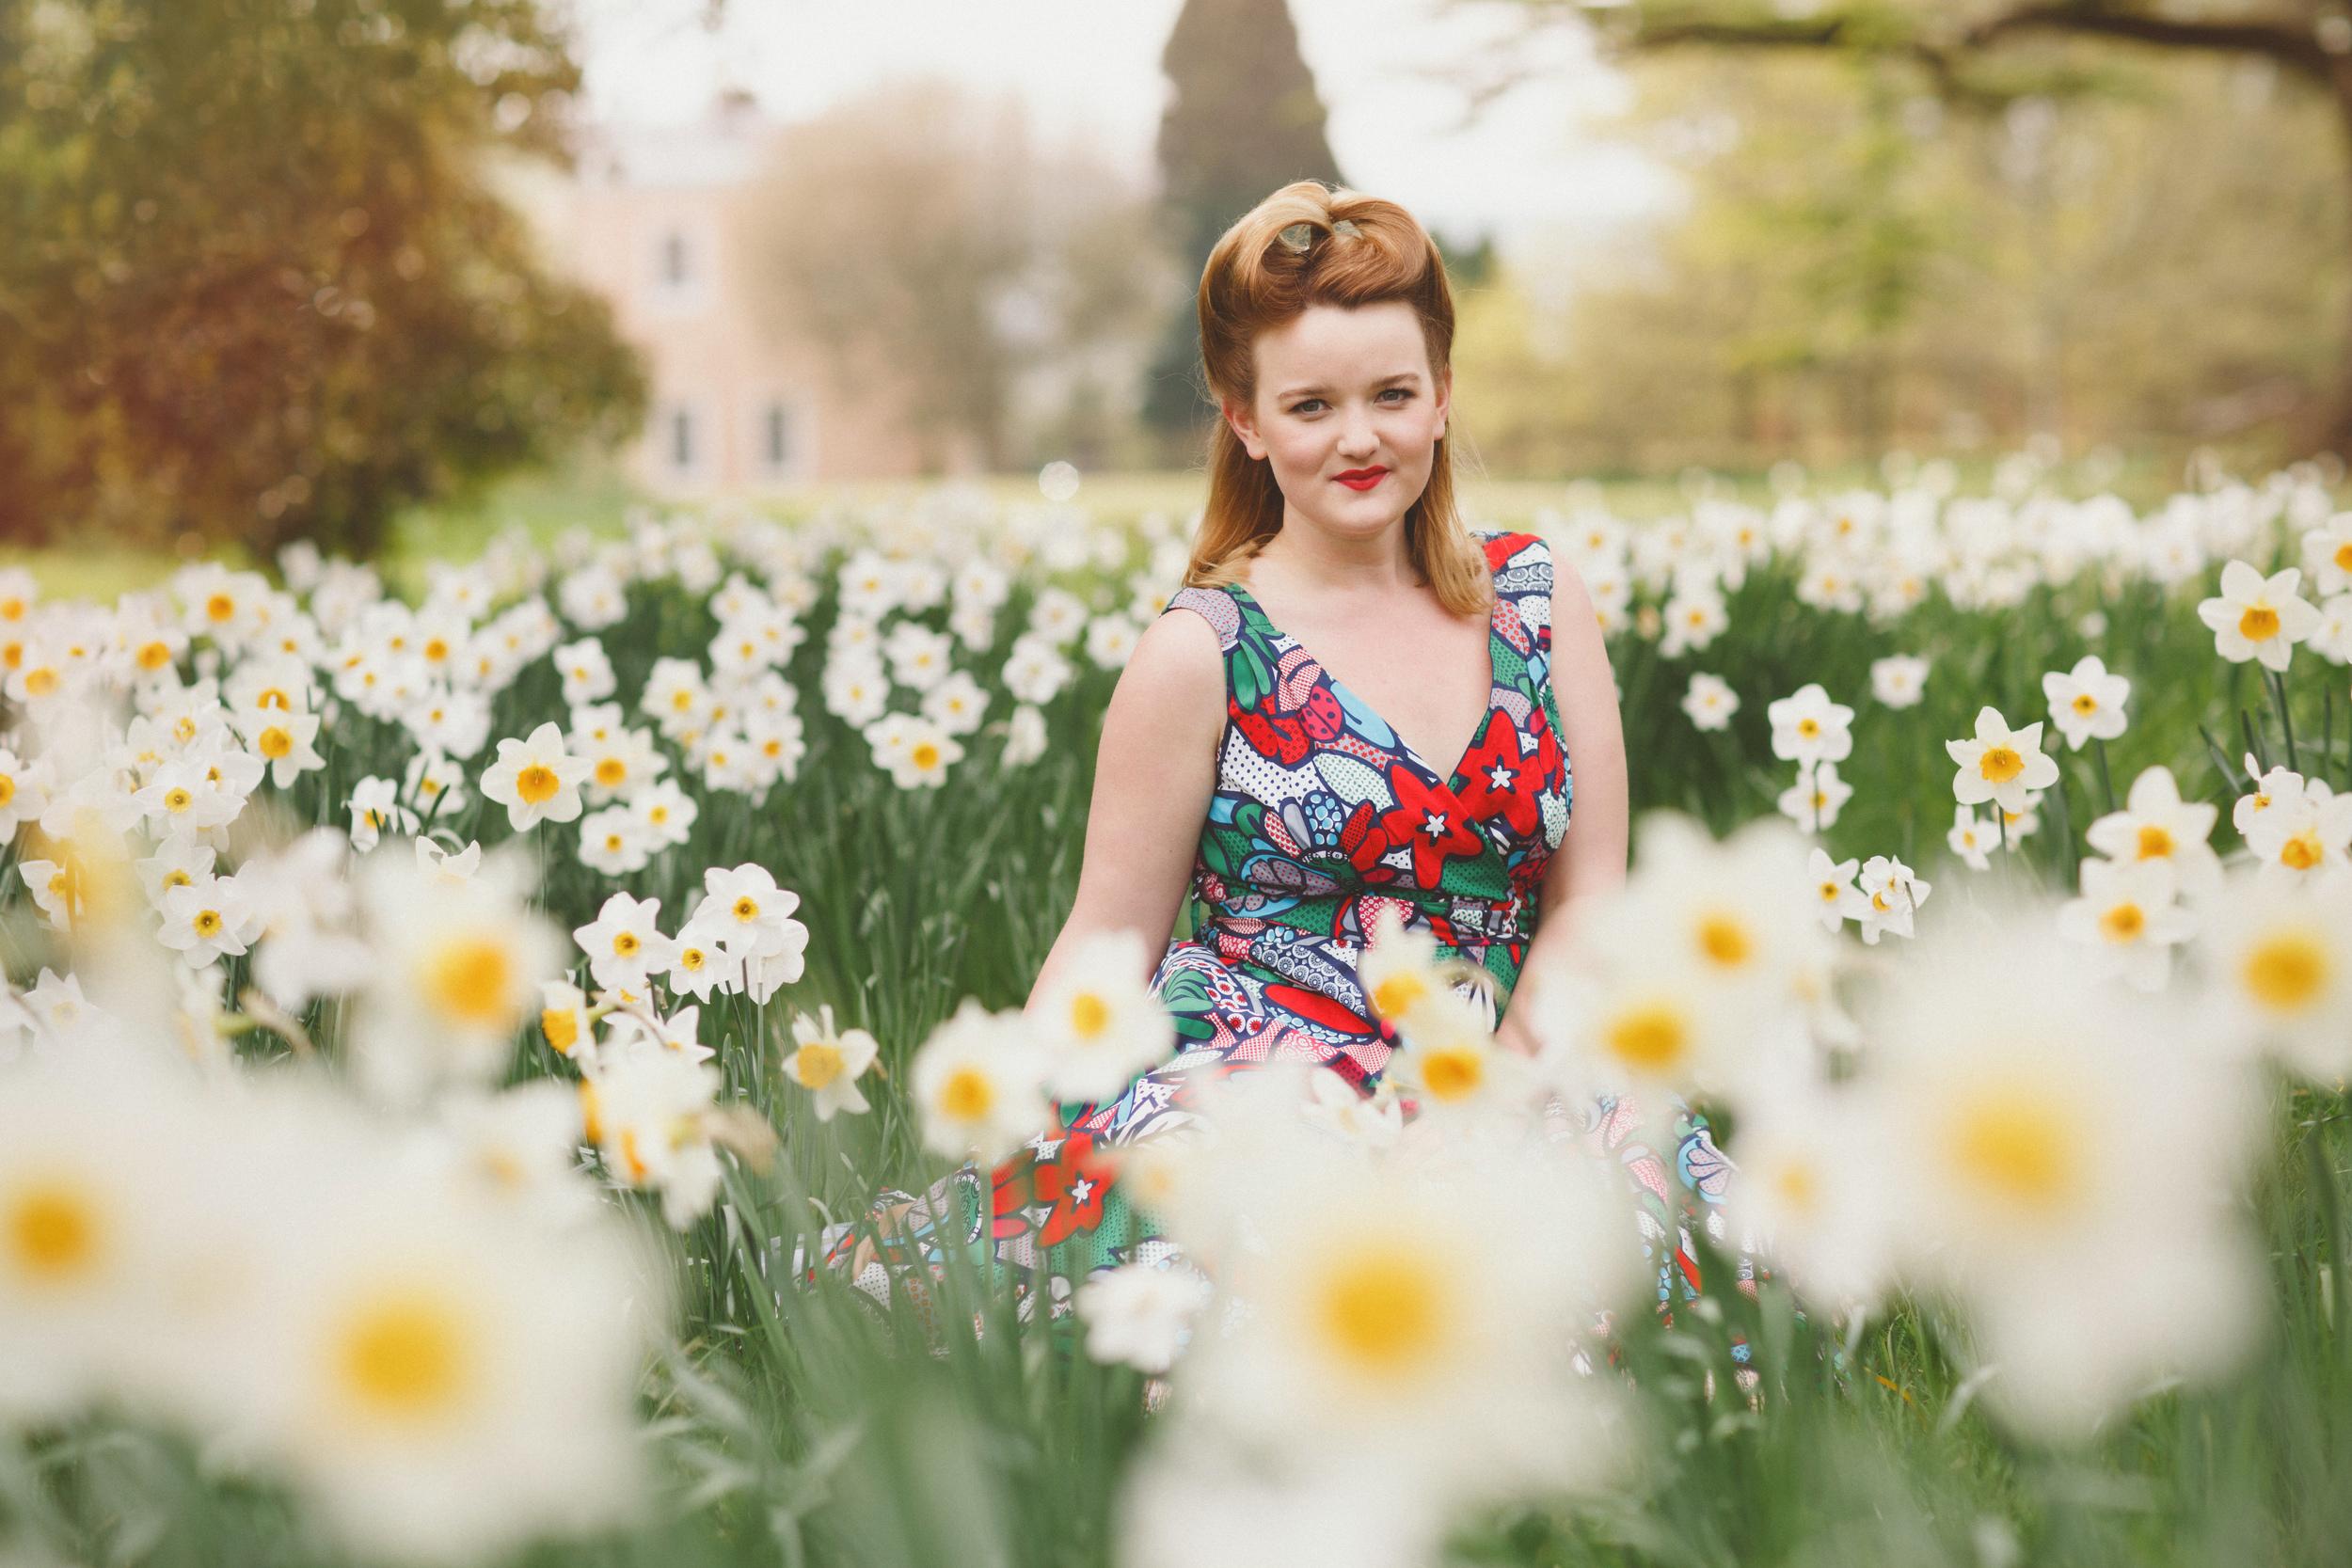 Nicki Feltham Photography - Make up by me